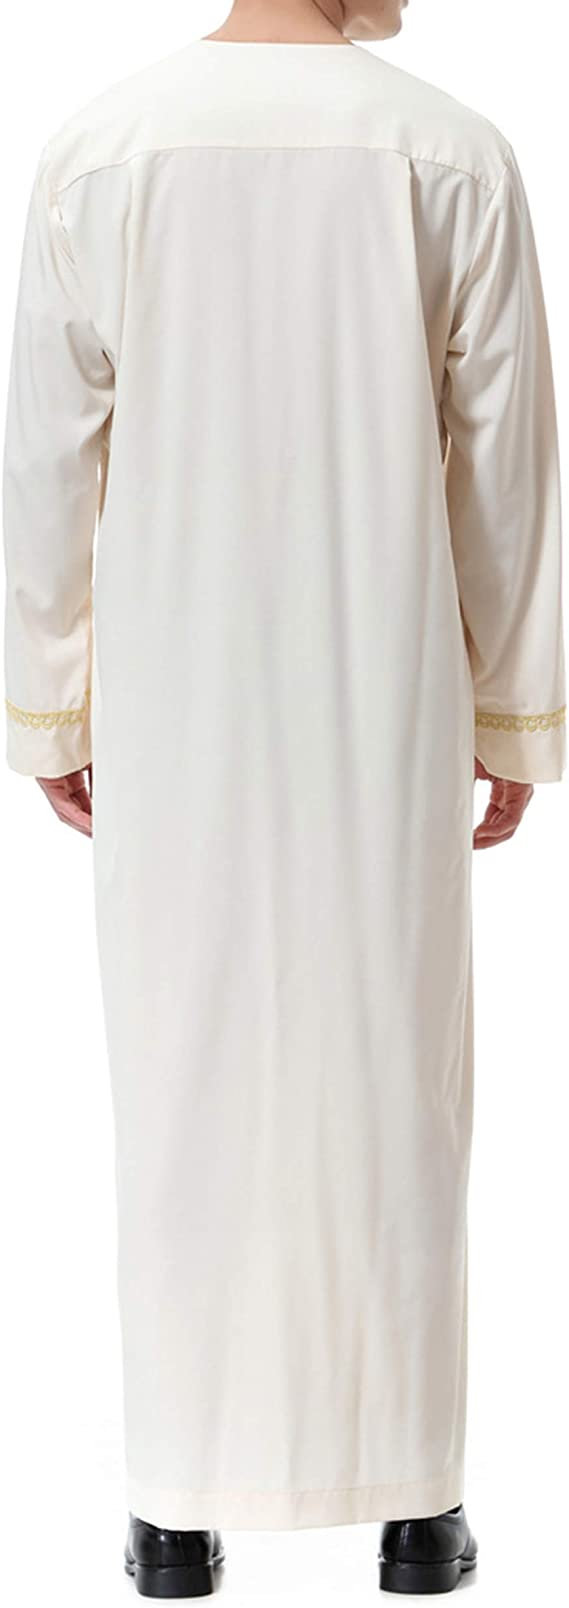 Ropa Abaya Maxi Vestidos Islamic-Hombre de Caftán Camisa Arabe Kaftan Manga Larga: Amazon.es: Ropa y accesorios